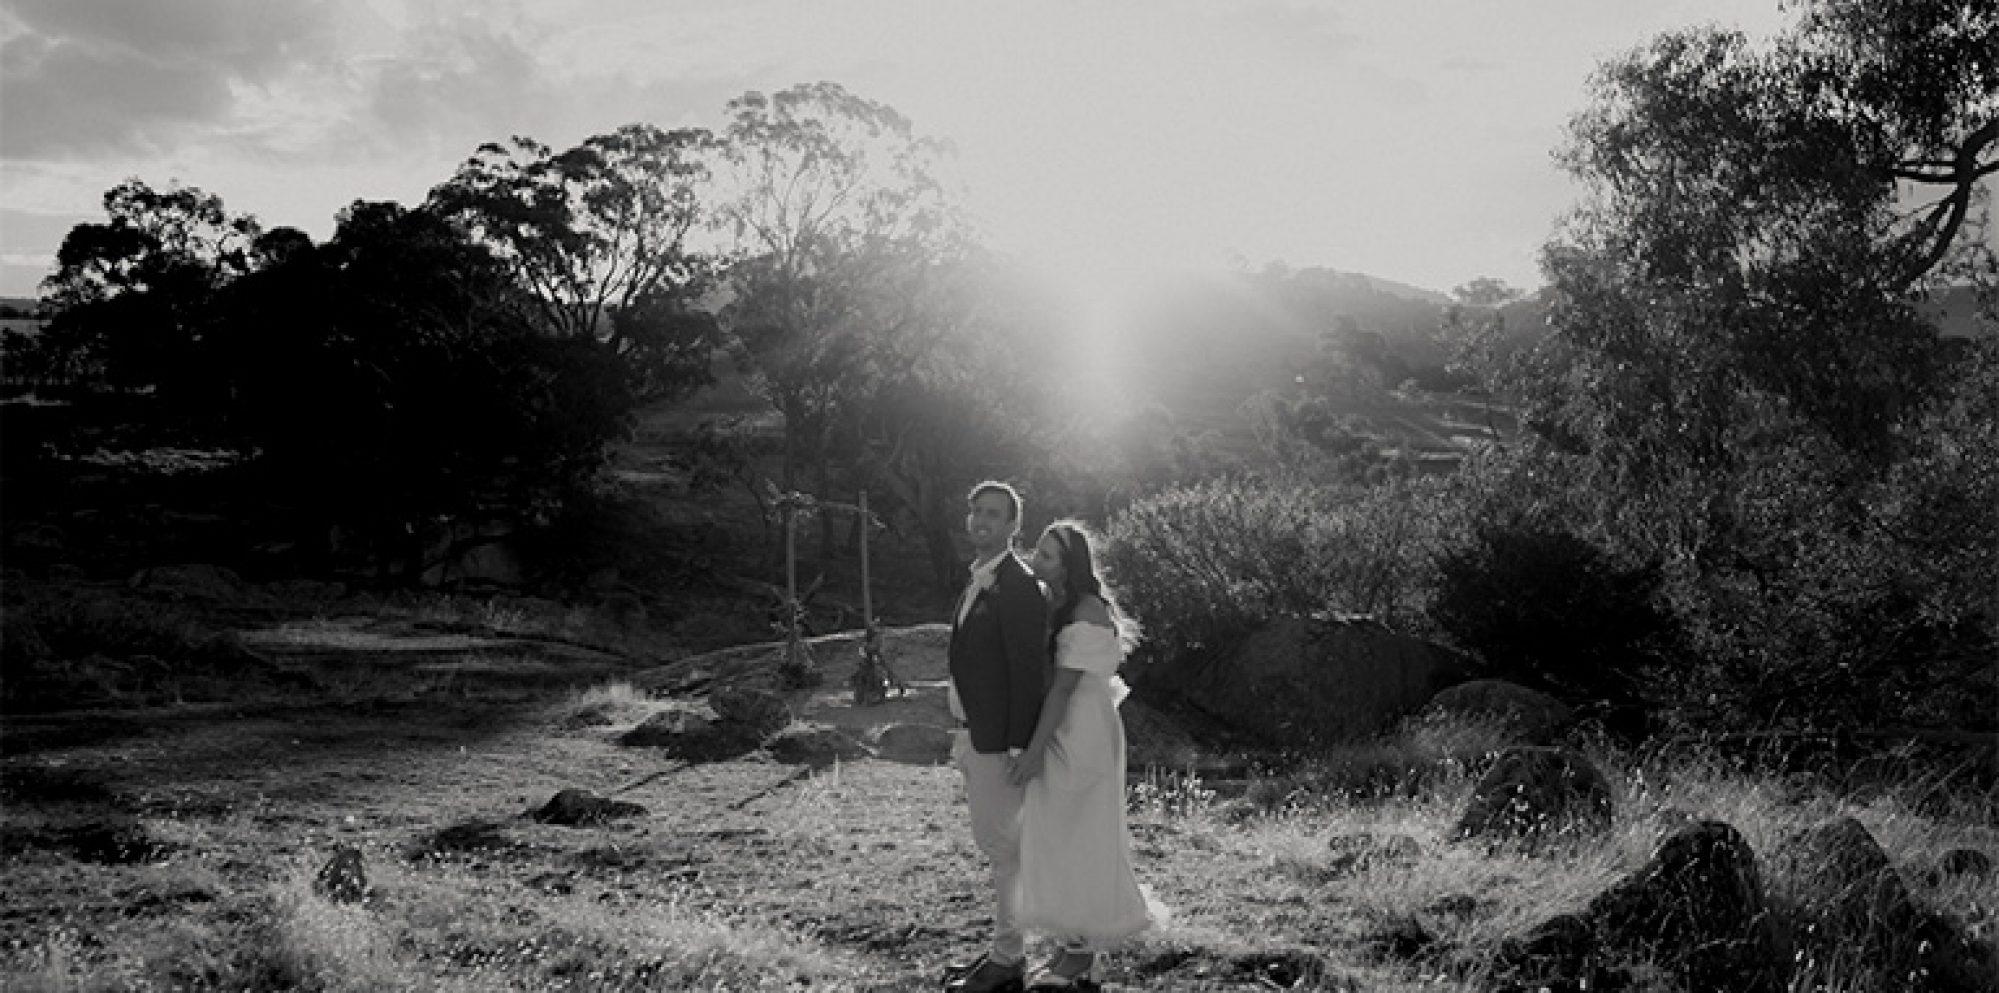 Danielle & corey wedding photography @ mimosa glen